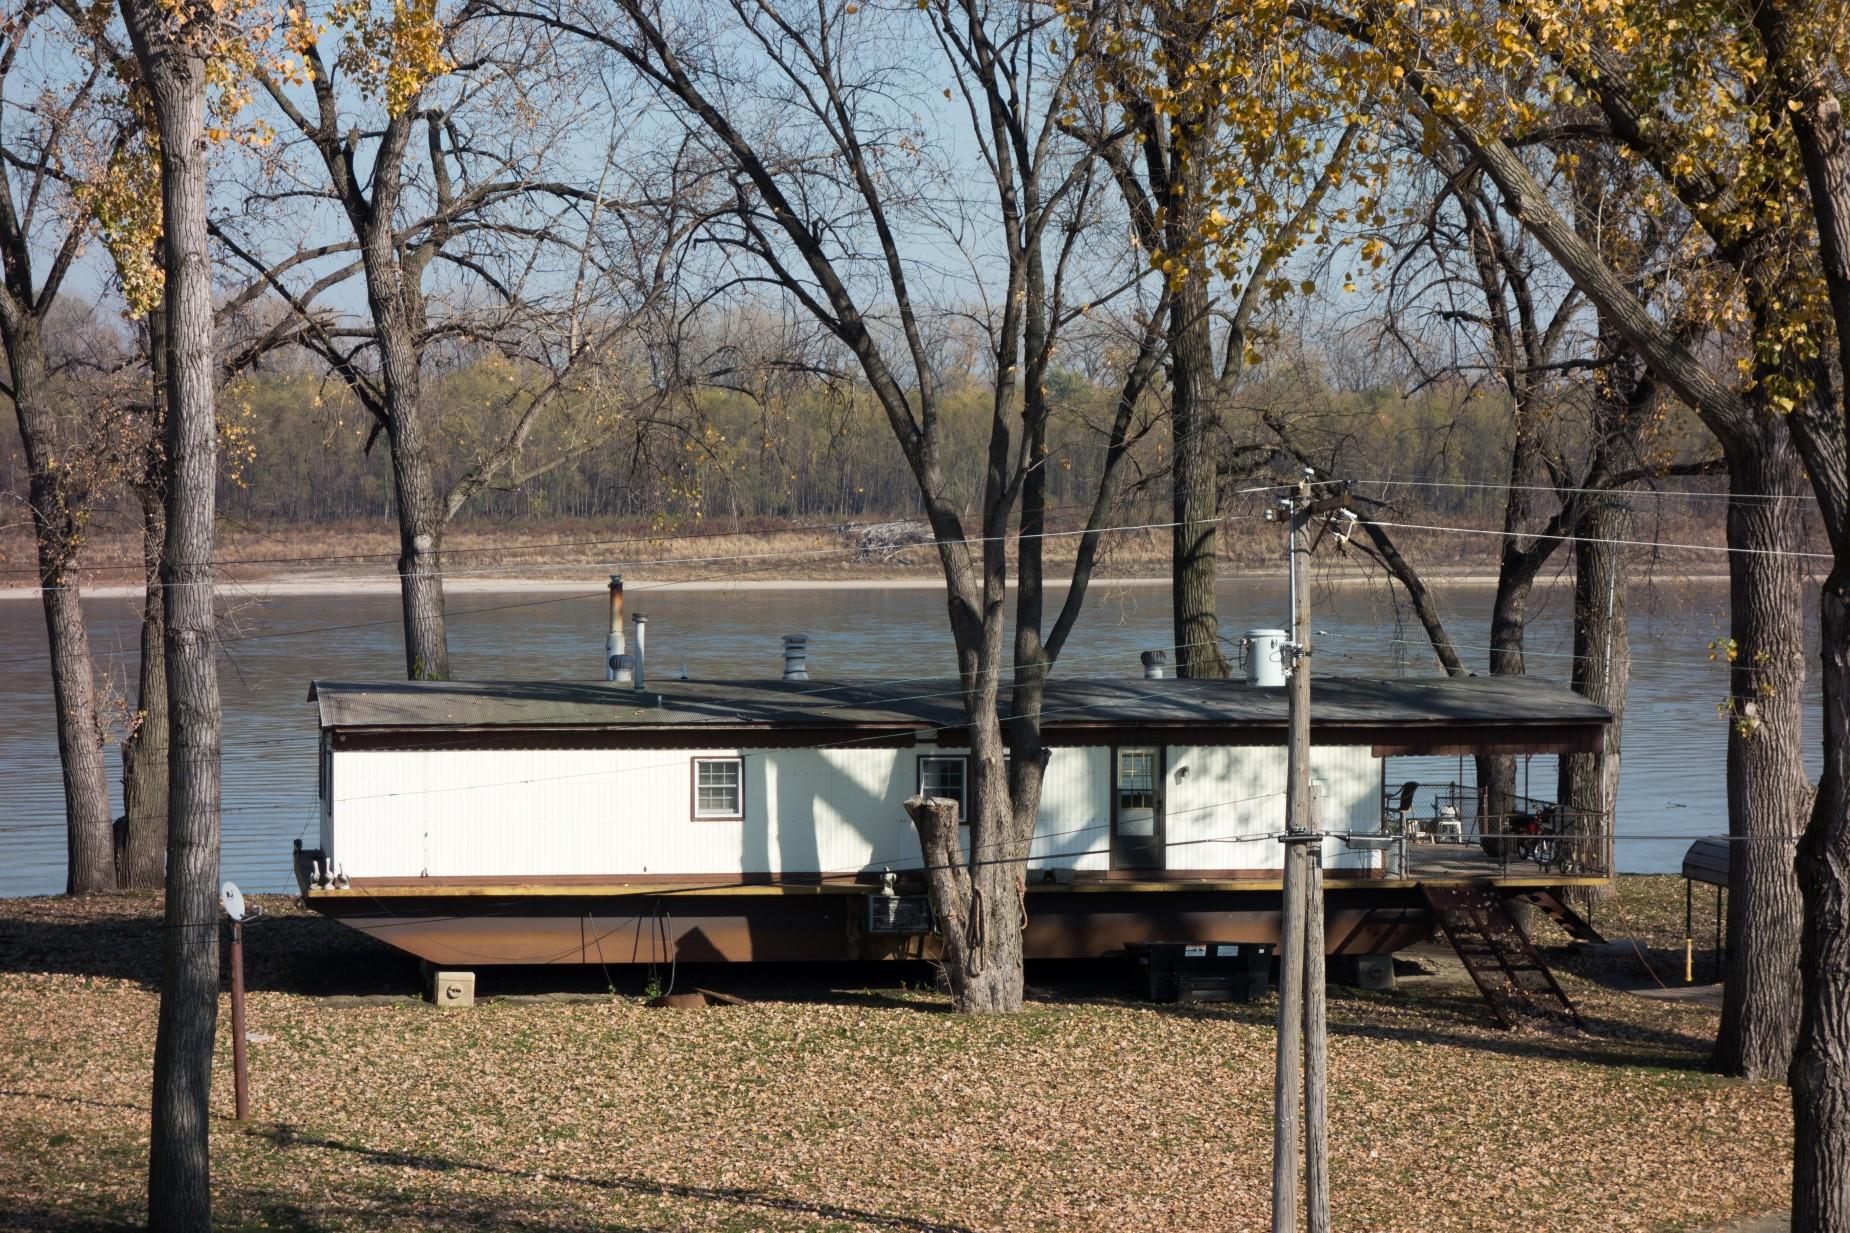 St-Louis-Bicycling-Riverview-Trail-27-1850x1233.jpg